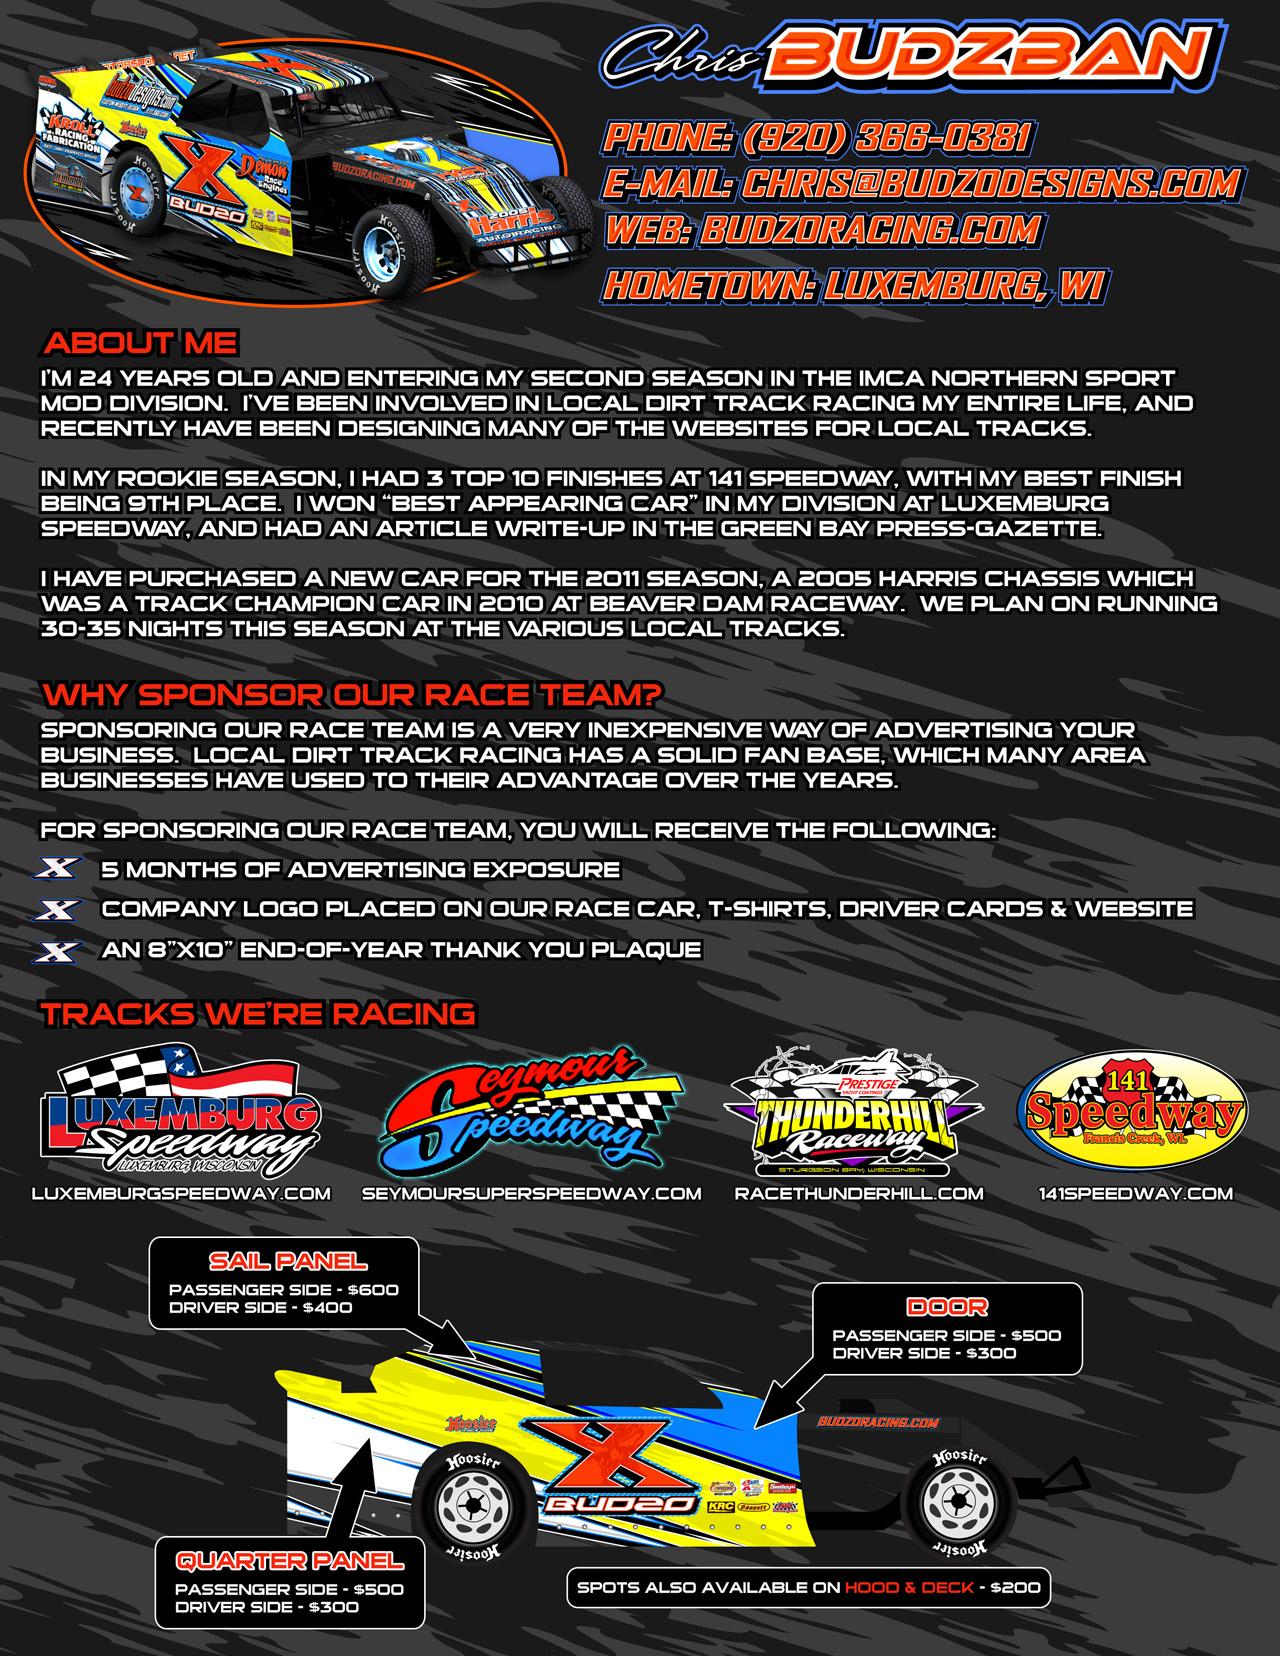 2011 Marketing Proposal Budzo Racing X Chris Budzban Imca